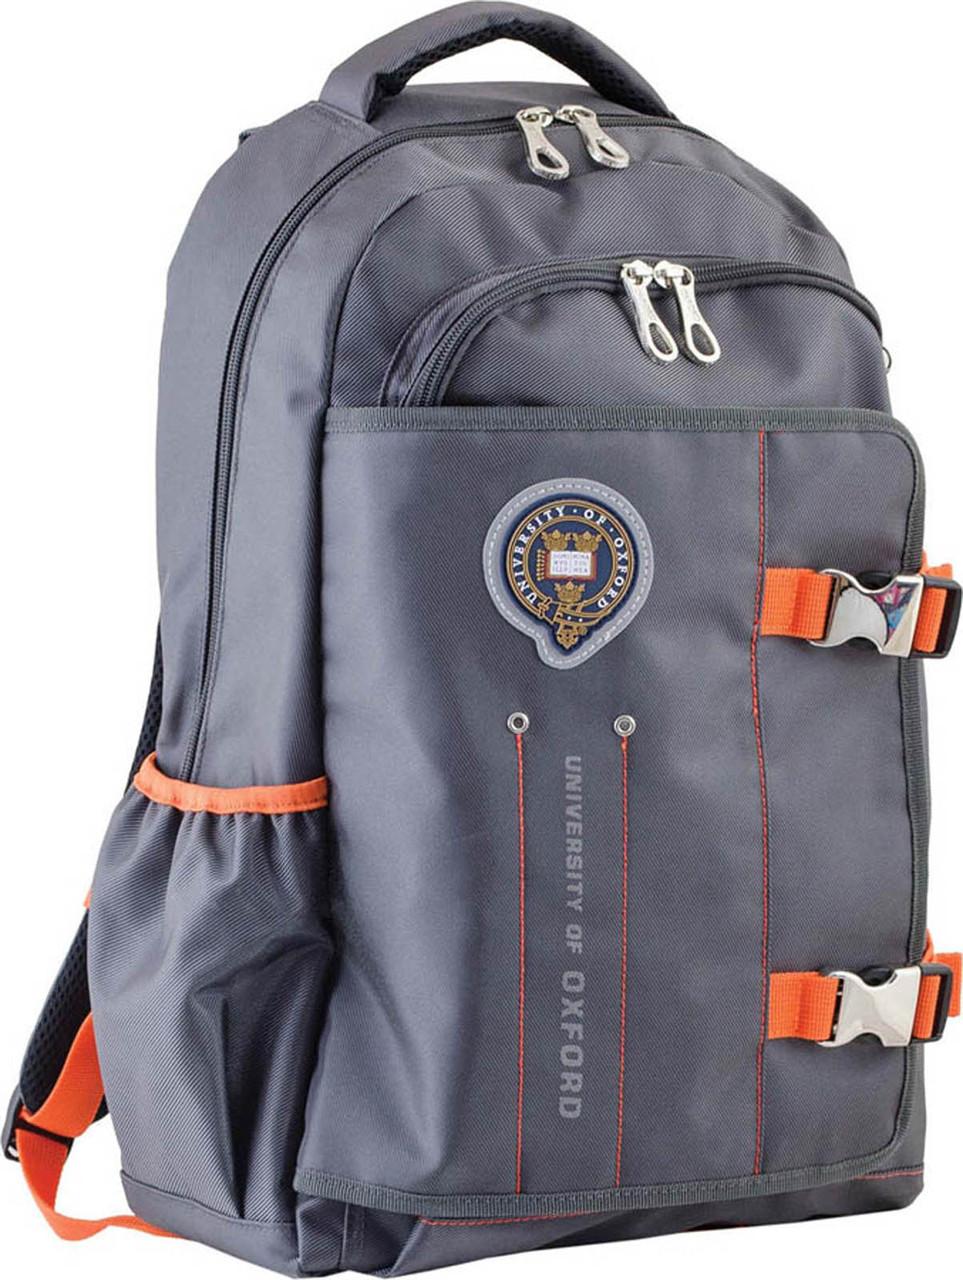 Рюкзак городской YES  OX 302, серый, 30*47*14.5 код: 554009